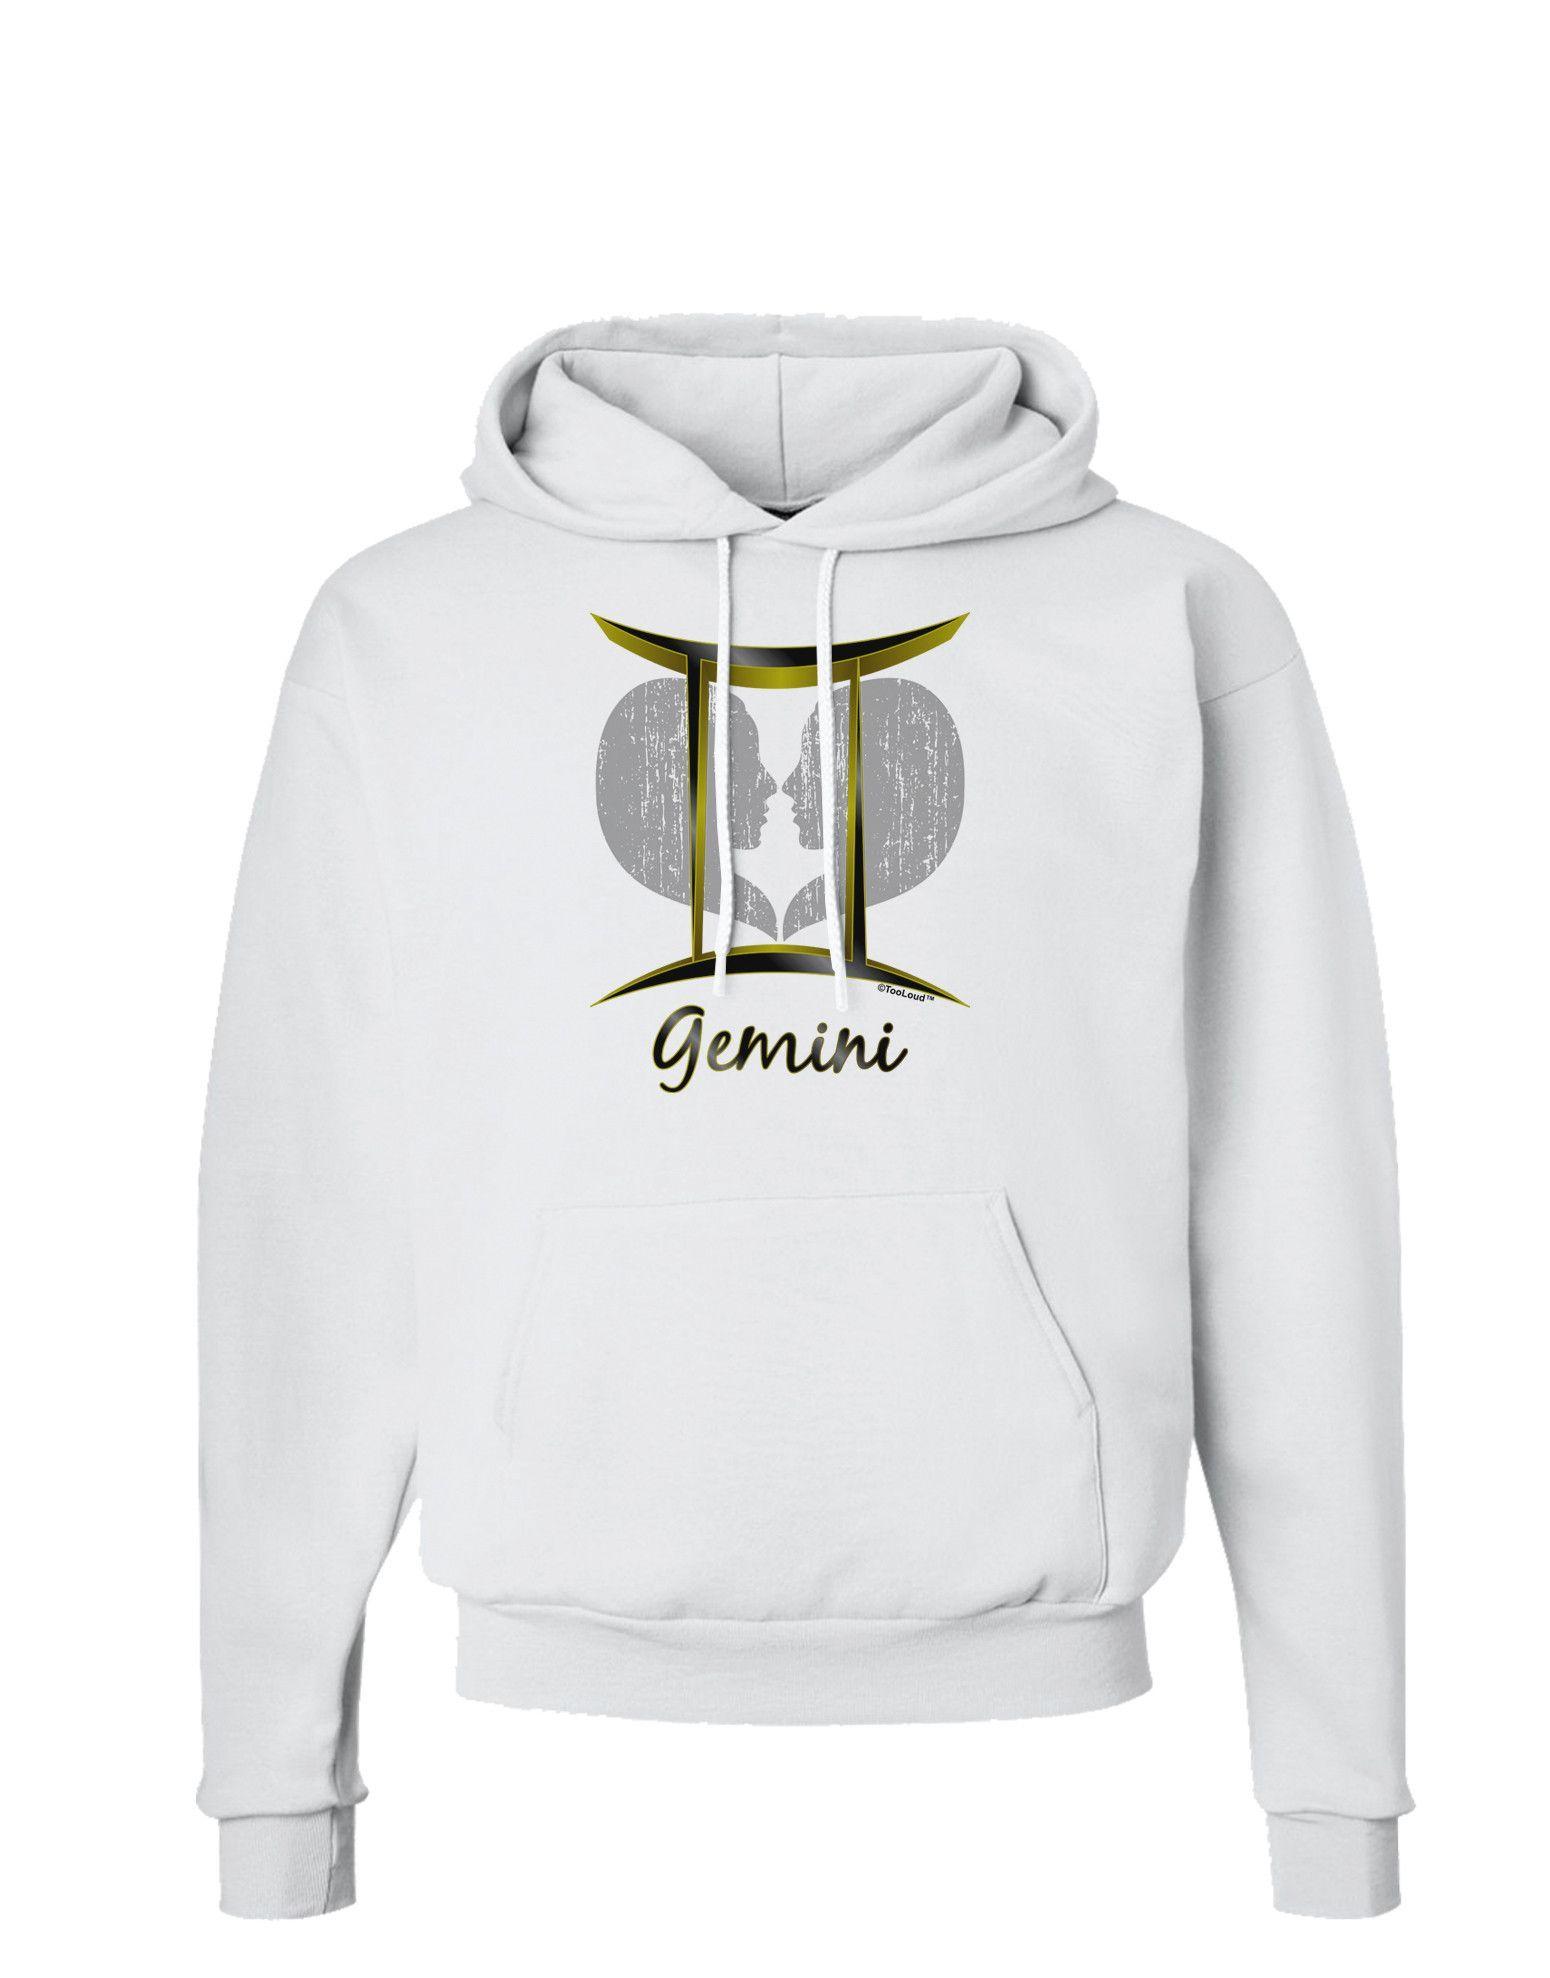 Gemini symbol hoodie sweatshirt gemini symbol gemini and symbols tooloud gemini symbol hoodie sweatshirt buycottarizona